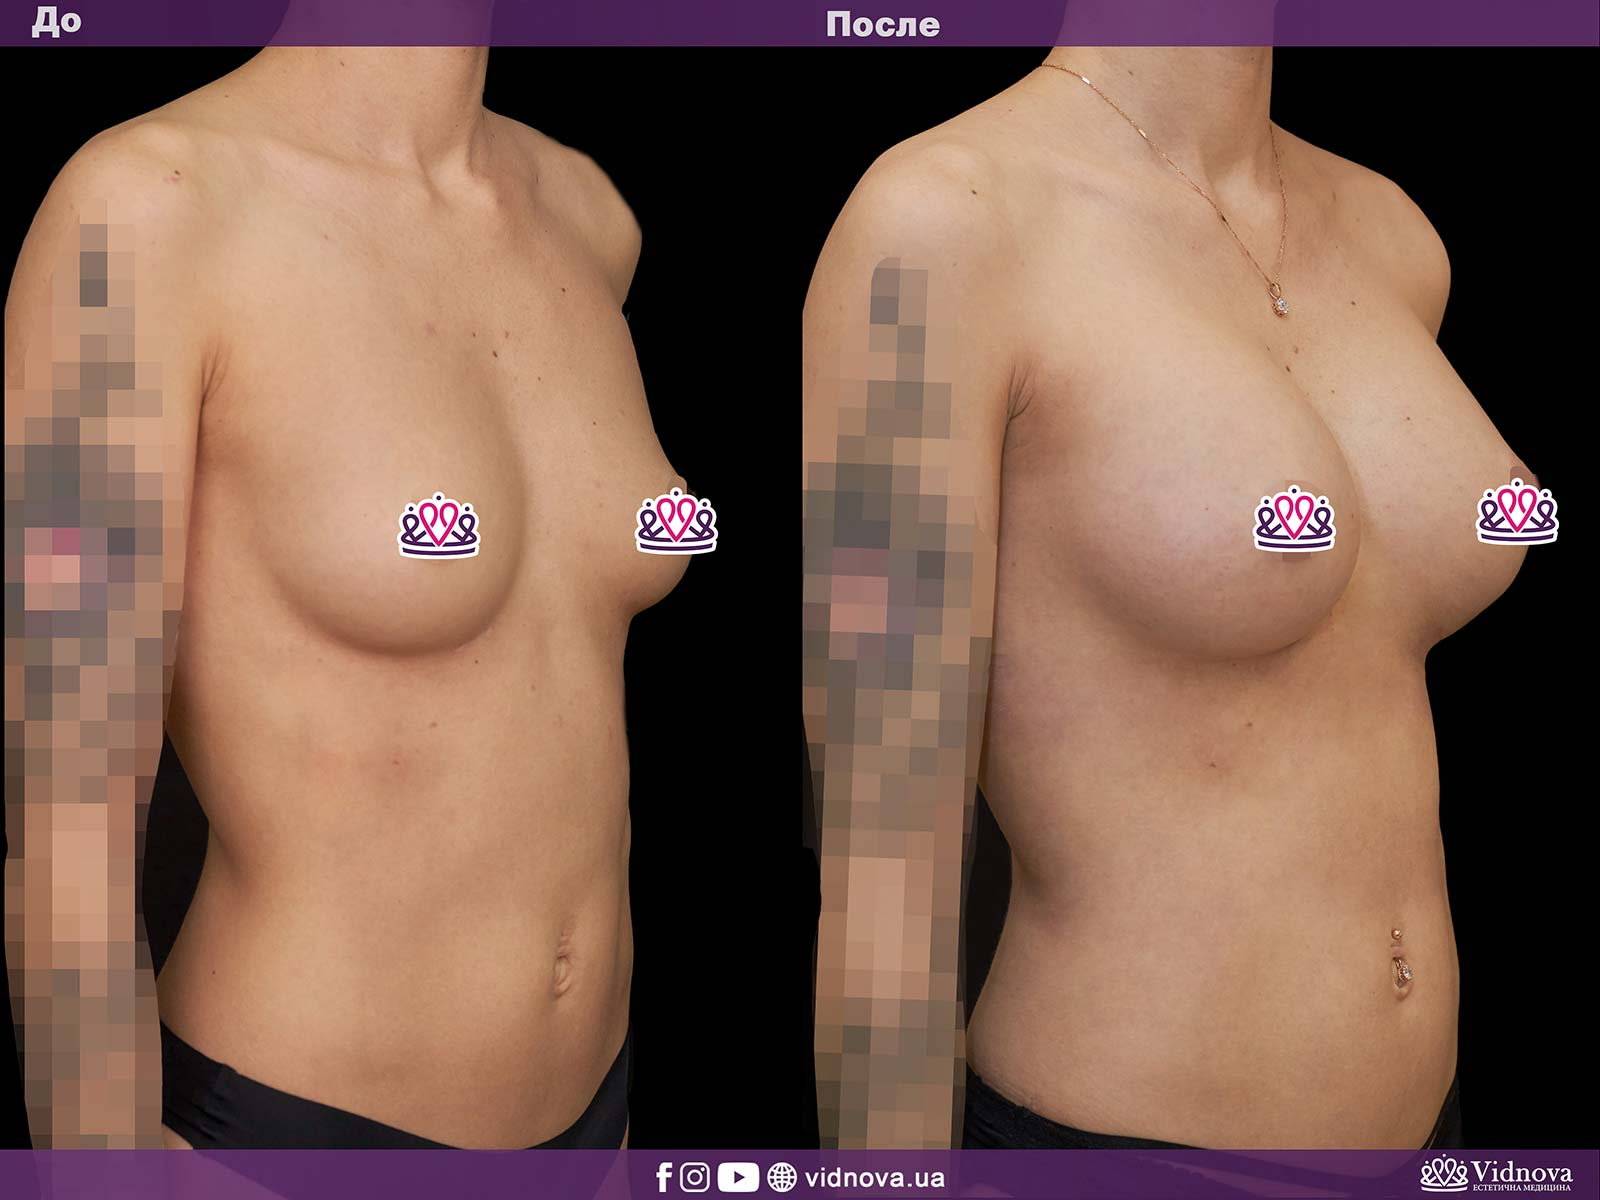 Увеличение груди: Фото ДО и ПОСЛЕ - Пример №7-2 - Клиника Vidnova